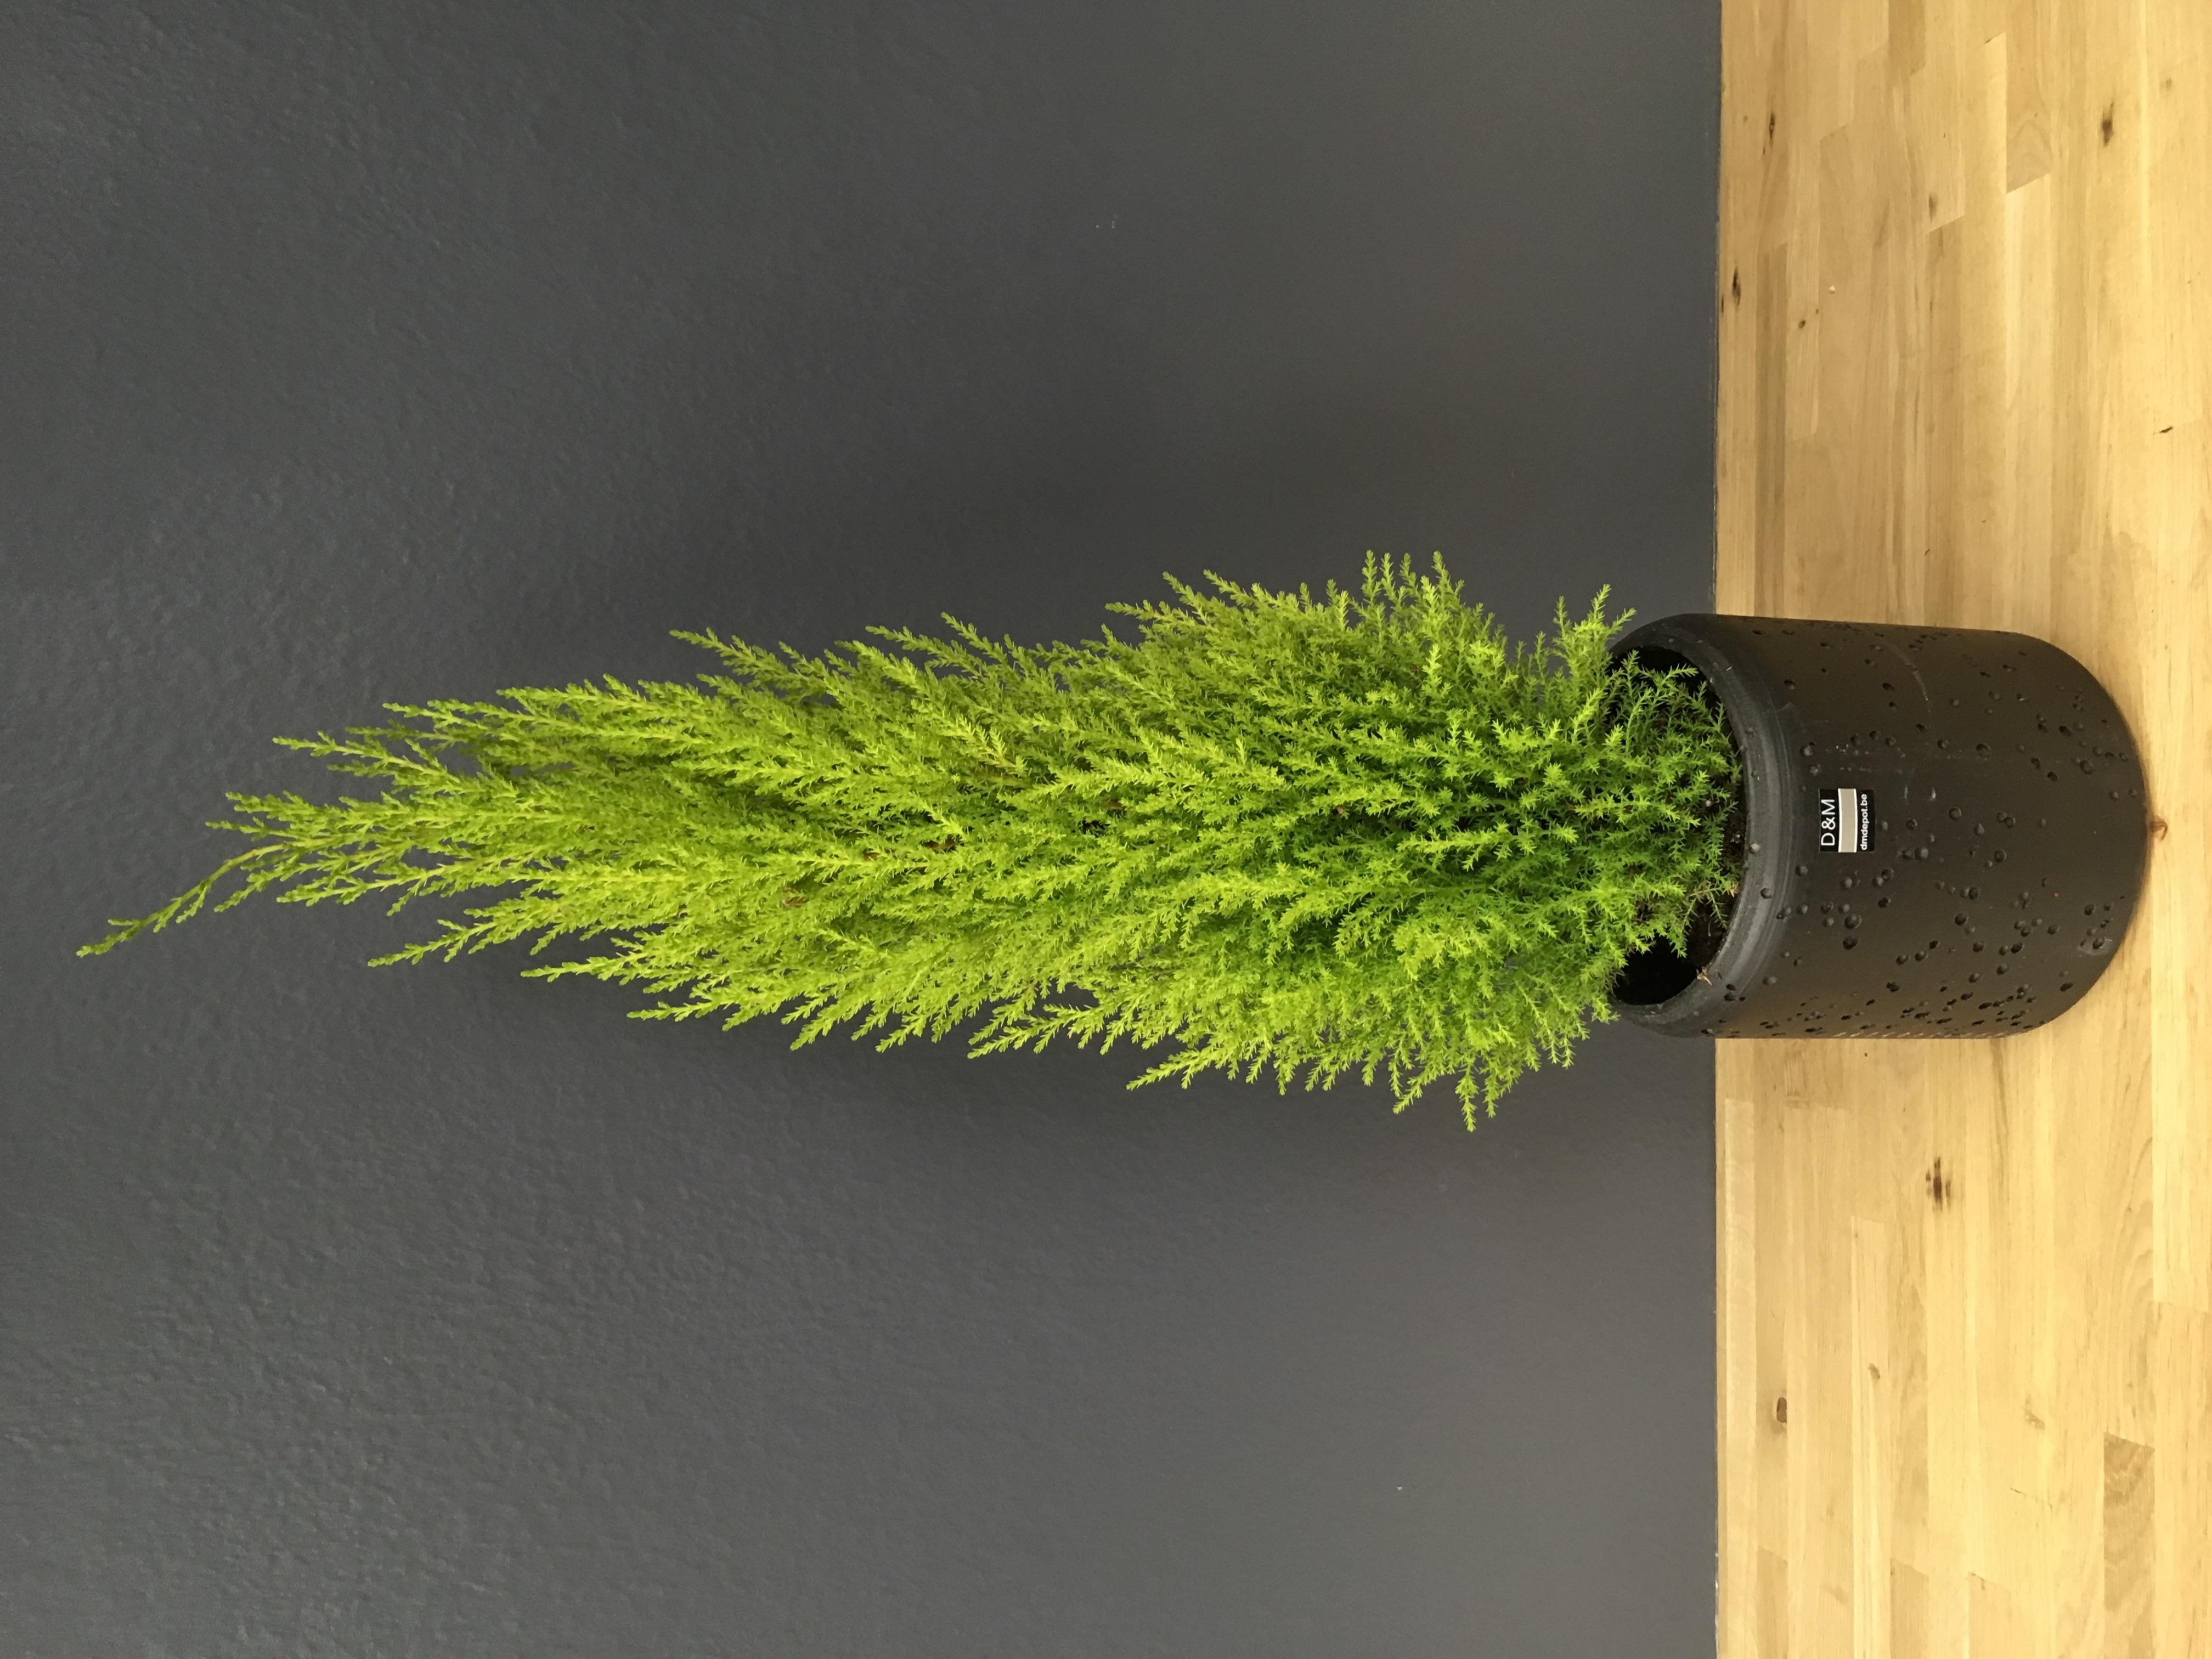 Cupressus macrocarpa elwoodi